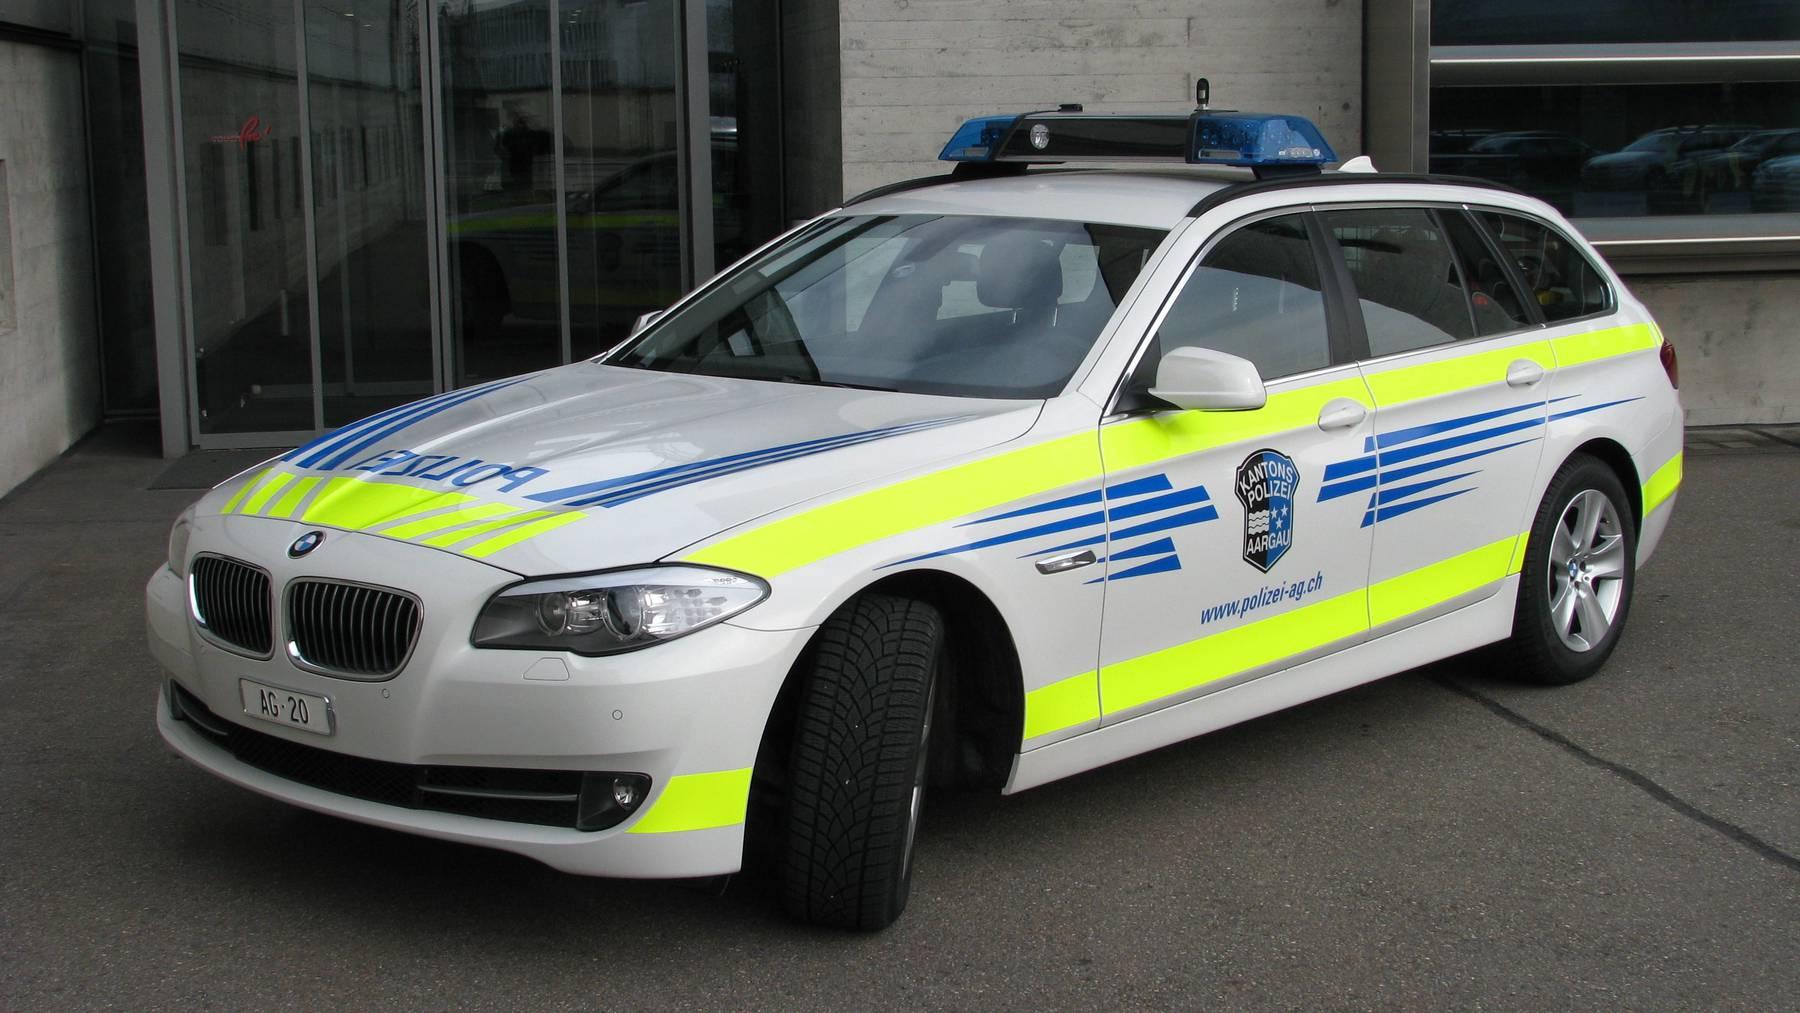 Kantonspolizei Aargau, Fahrzeug (Symbolbild)